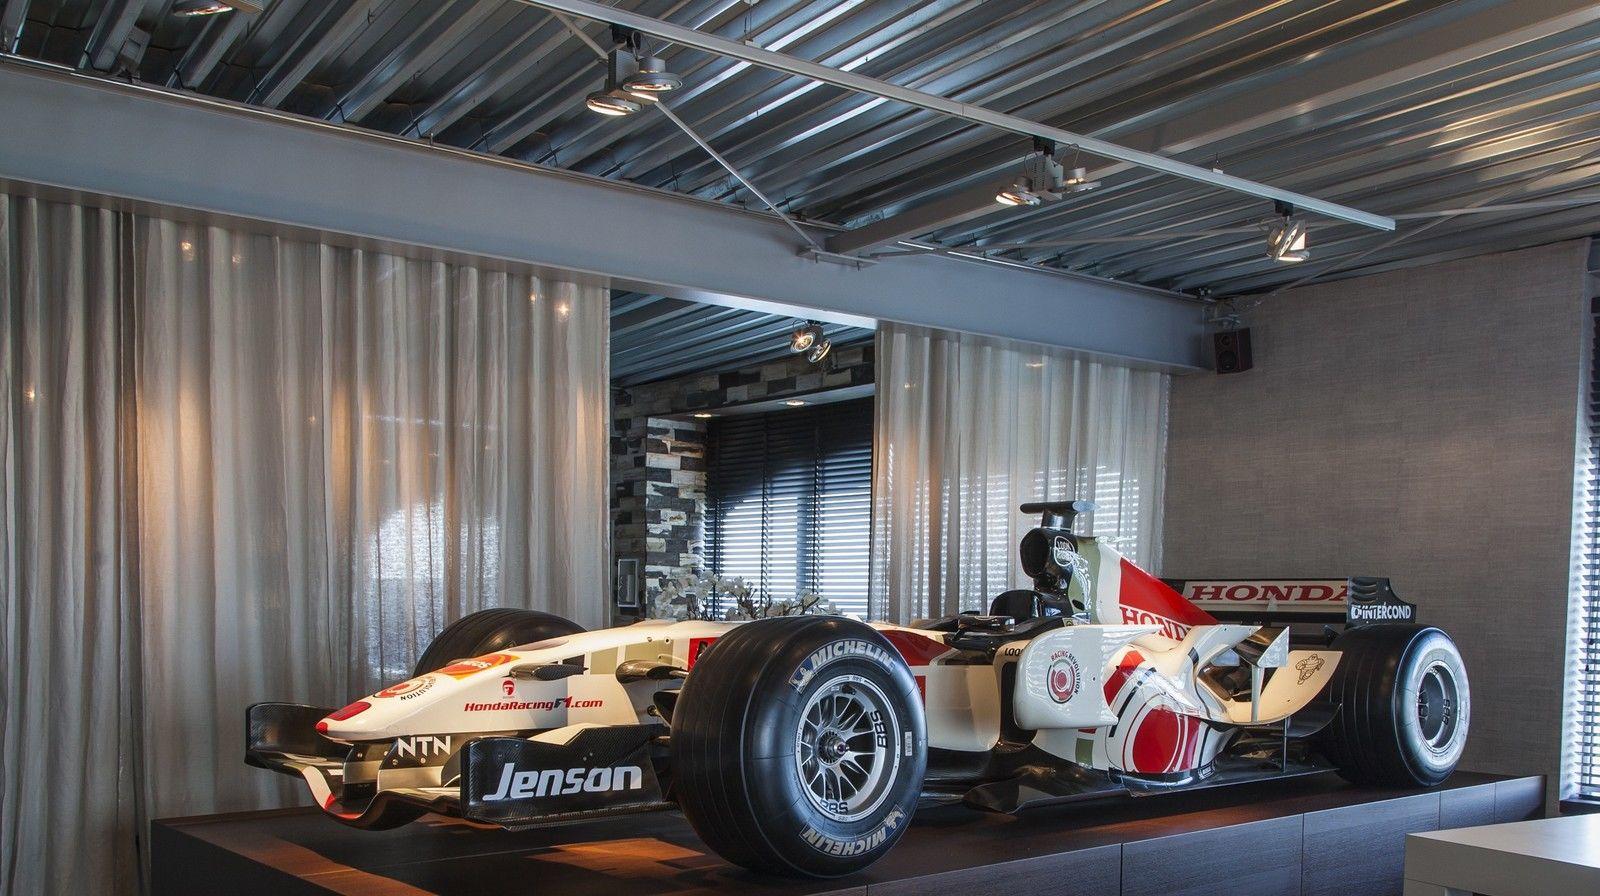 Jenson Button\'s Honda RA106-4 F1 Car For Sale at a Bargain Price ...